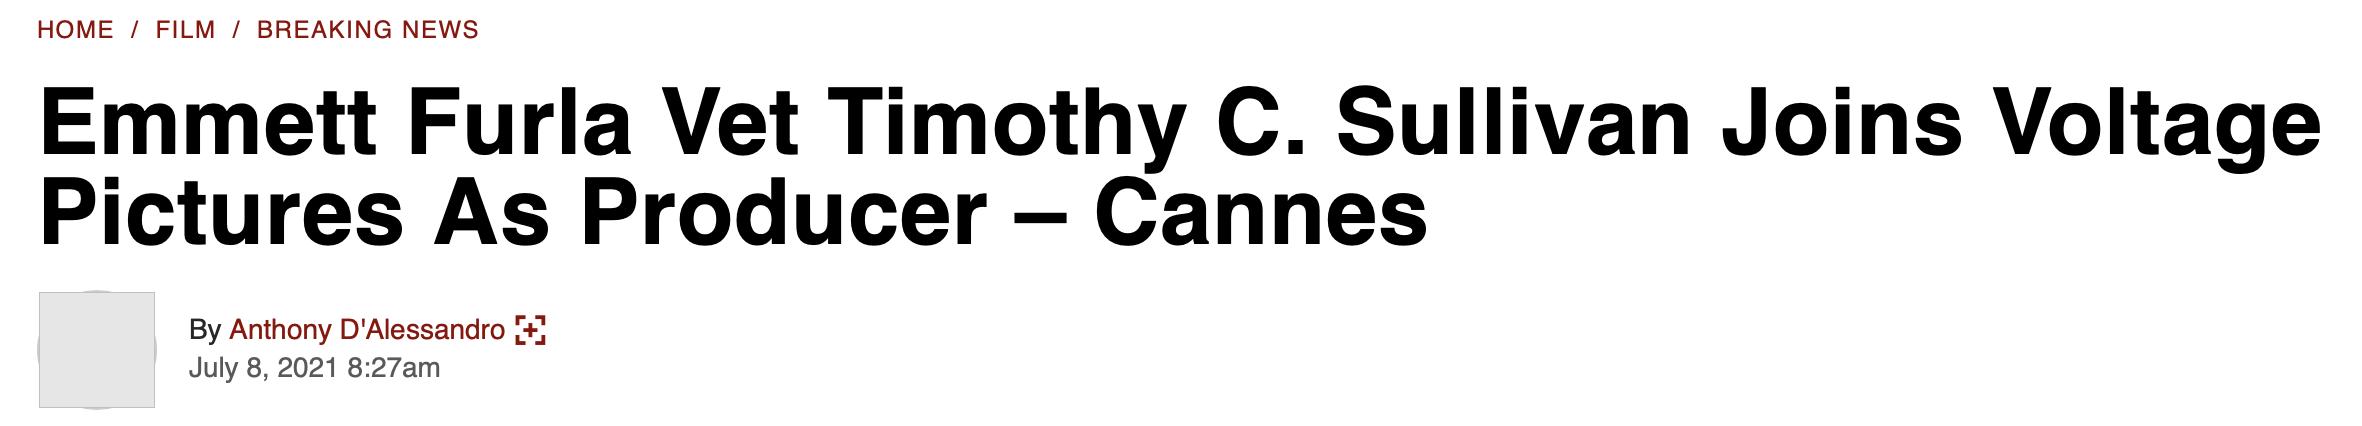 Emmett Furla Vet Timothy C. Sullivan Joins Voltage Pictures As Producer